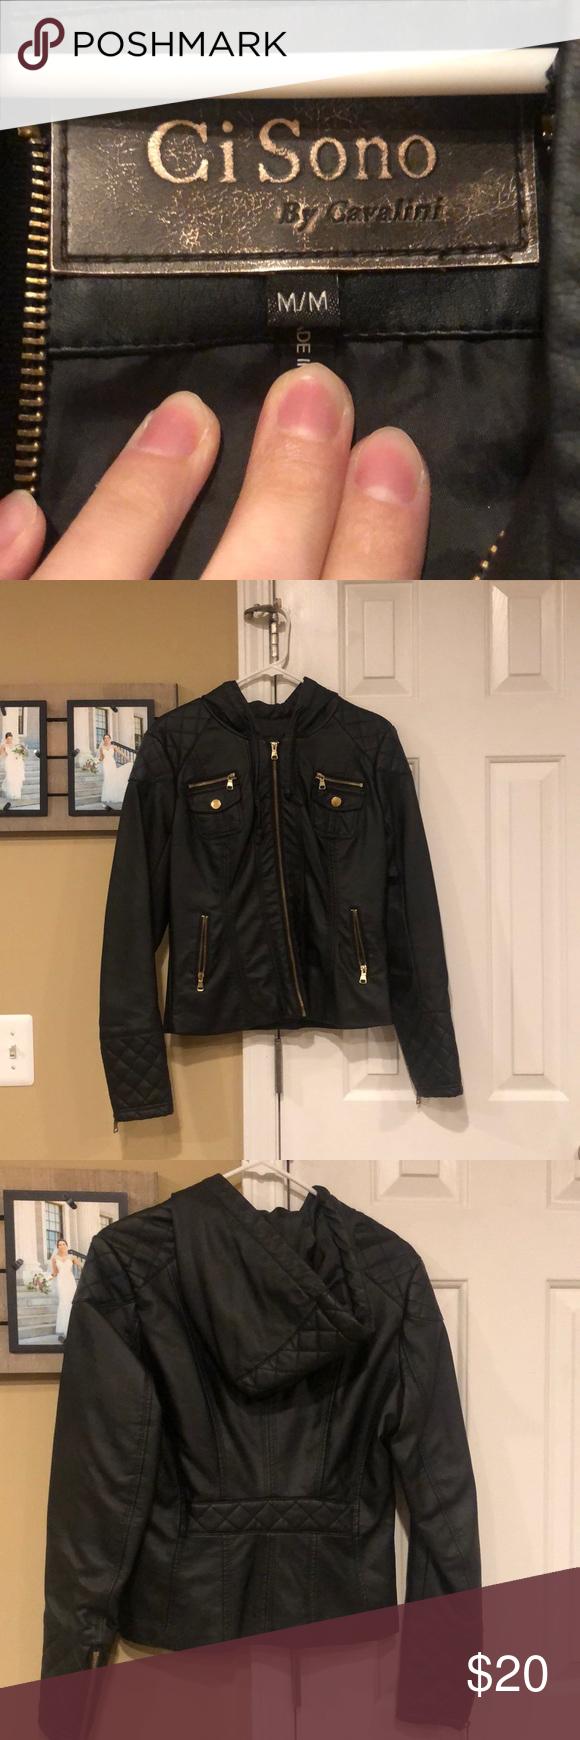 Ci Sono By Cavalini Faux Leather Jacket Leather Jacket Faux Leather Jackets Leather Jacket With Hood [ 1740 x 580 Pixel ]